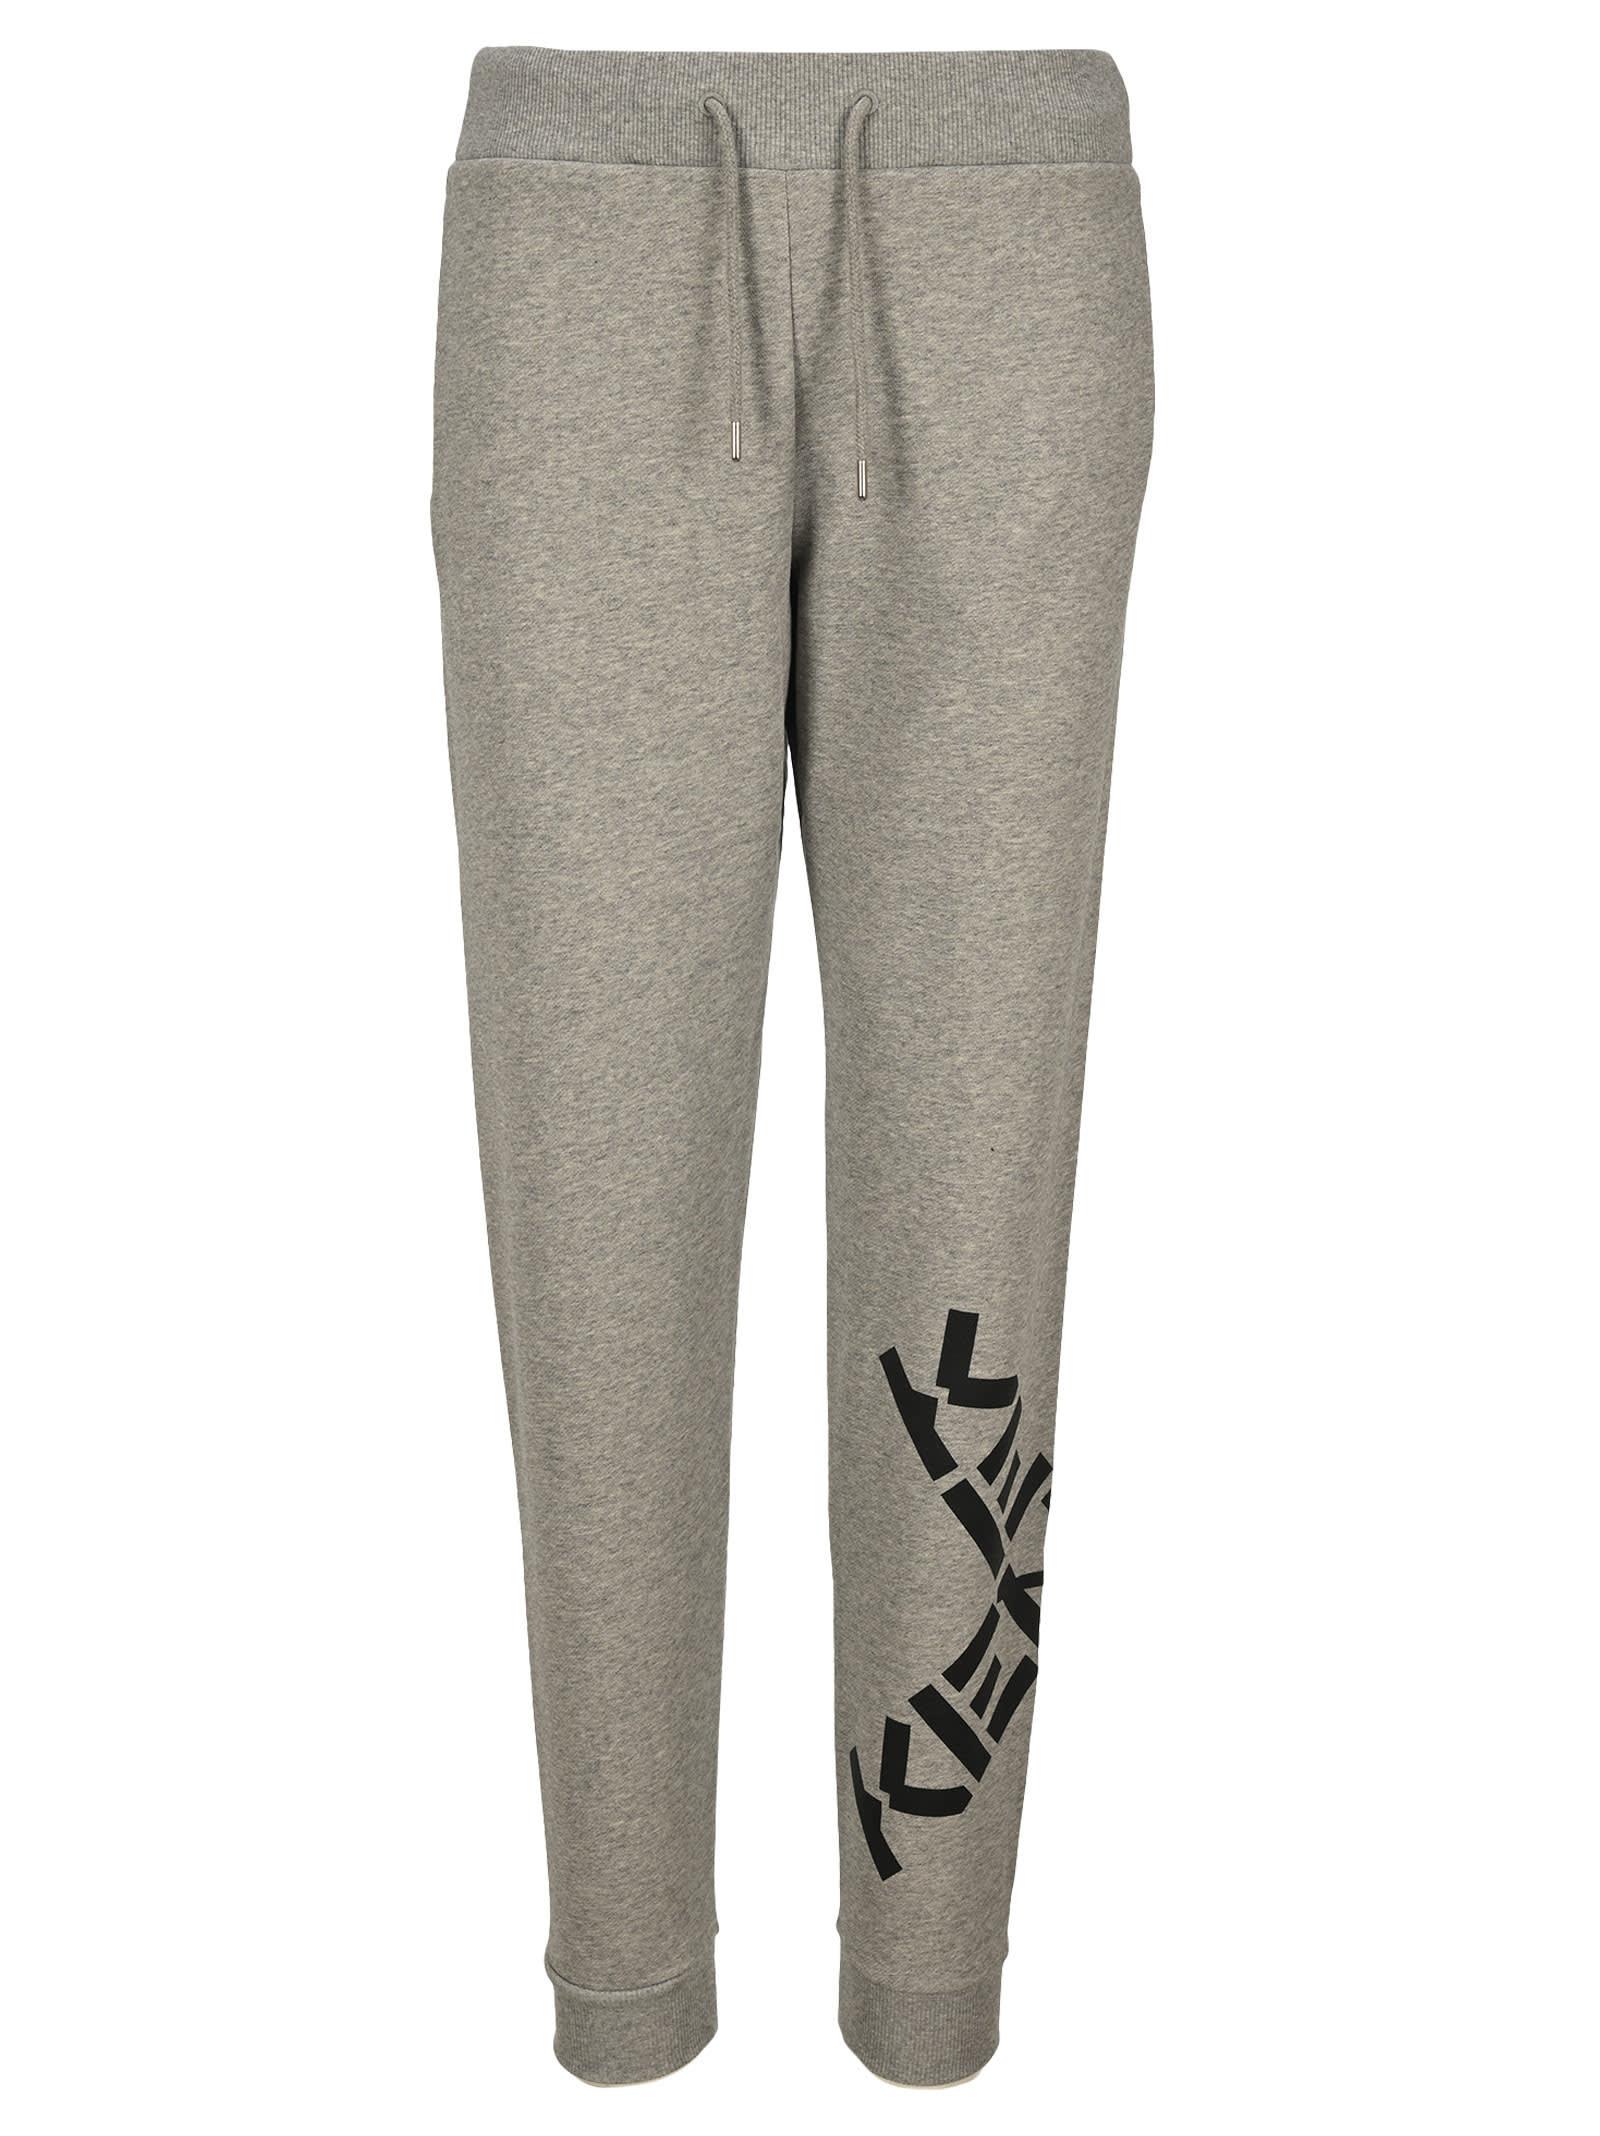 Kenzo Kenzo Sport big X Jogging Trousers